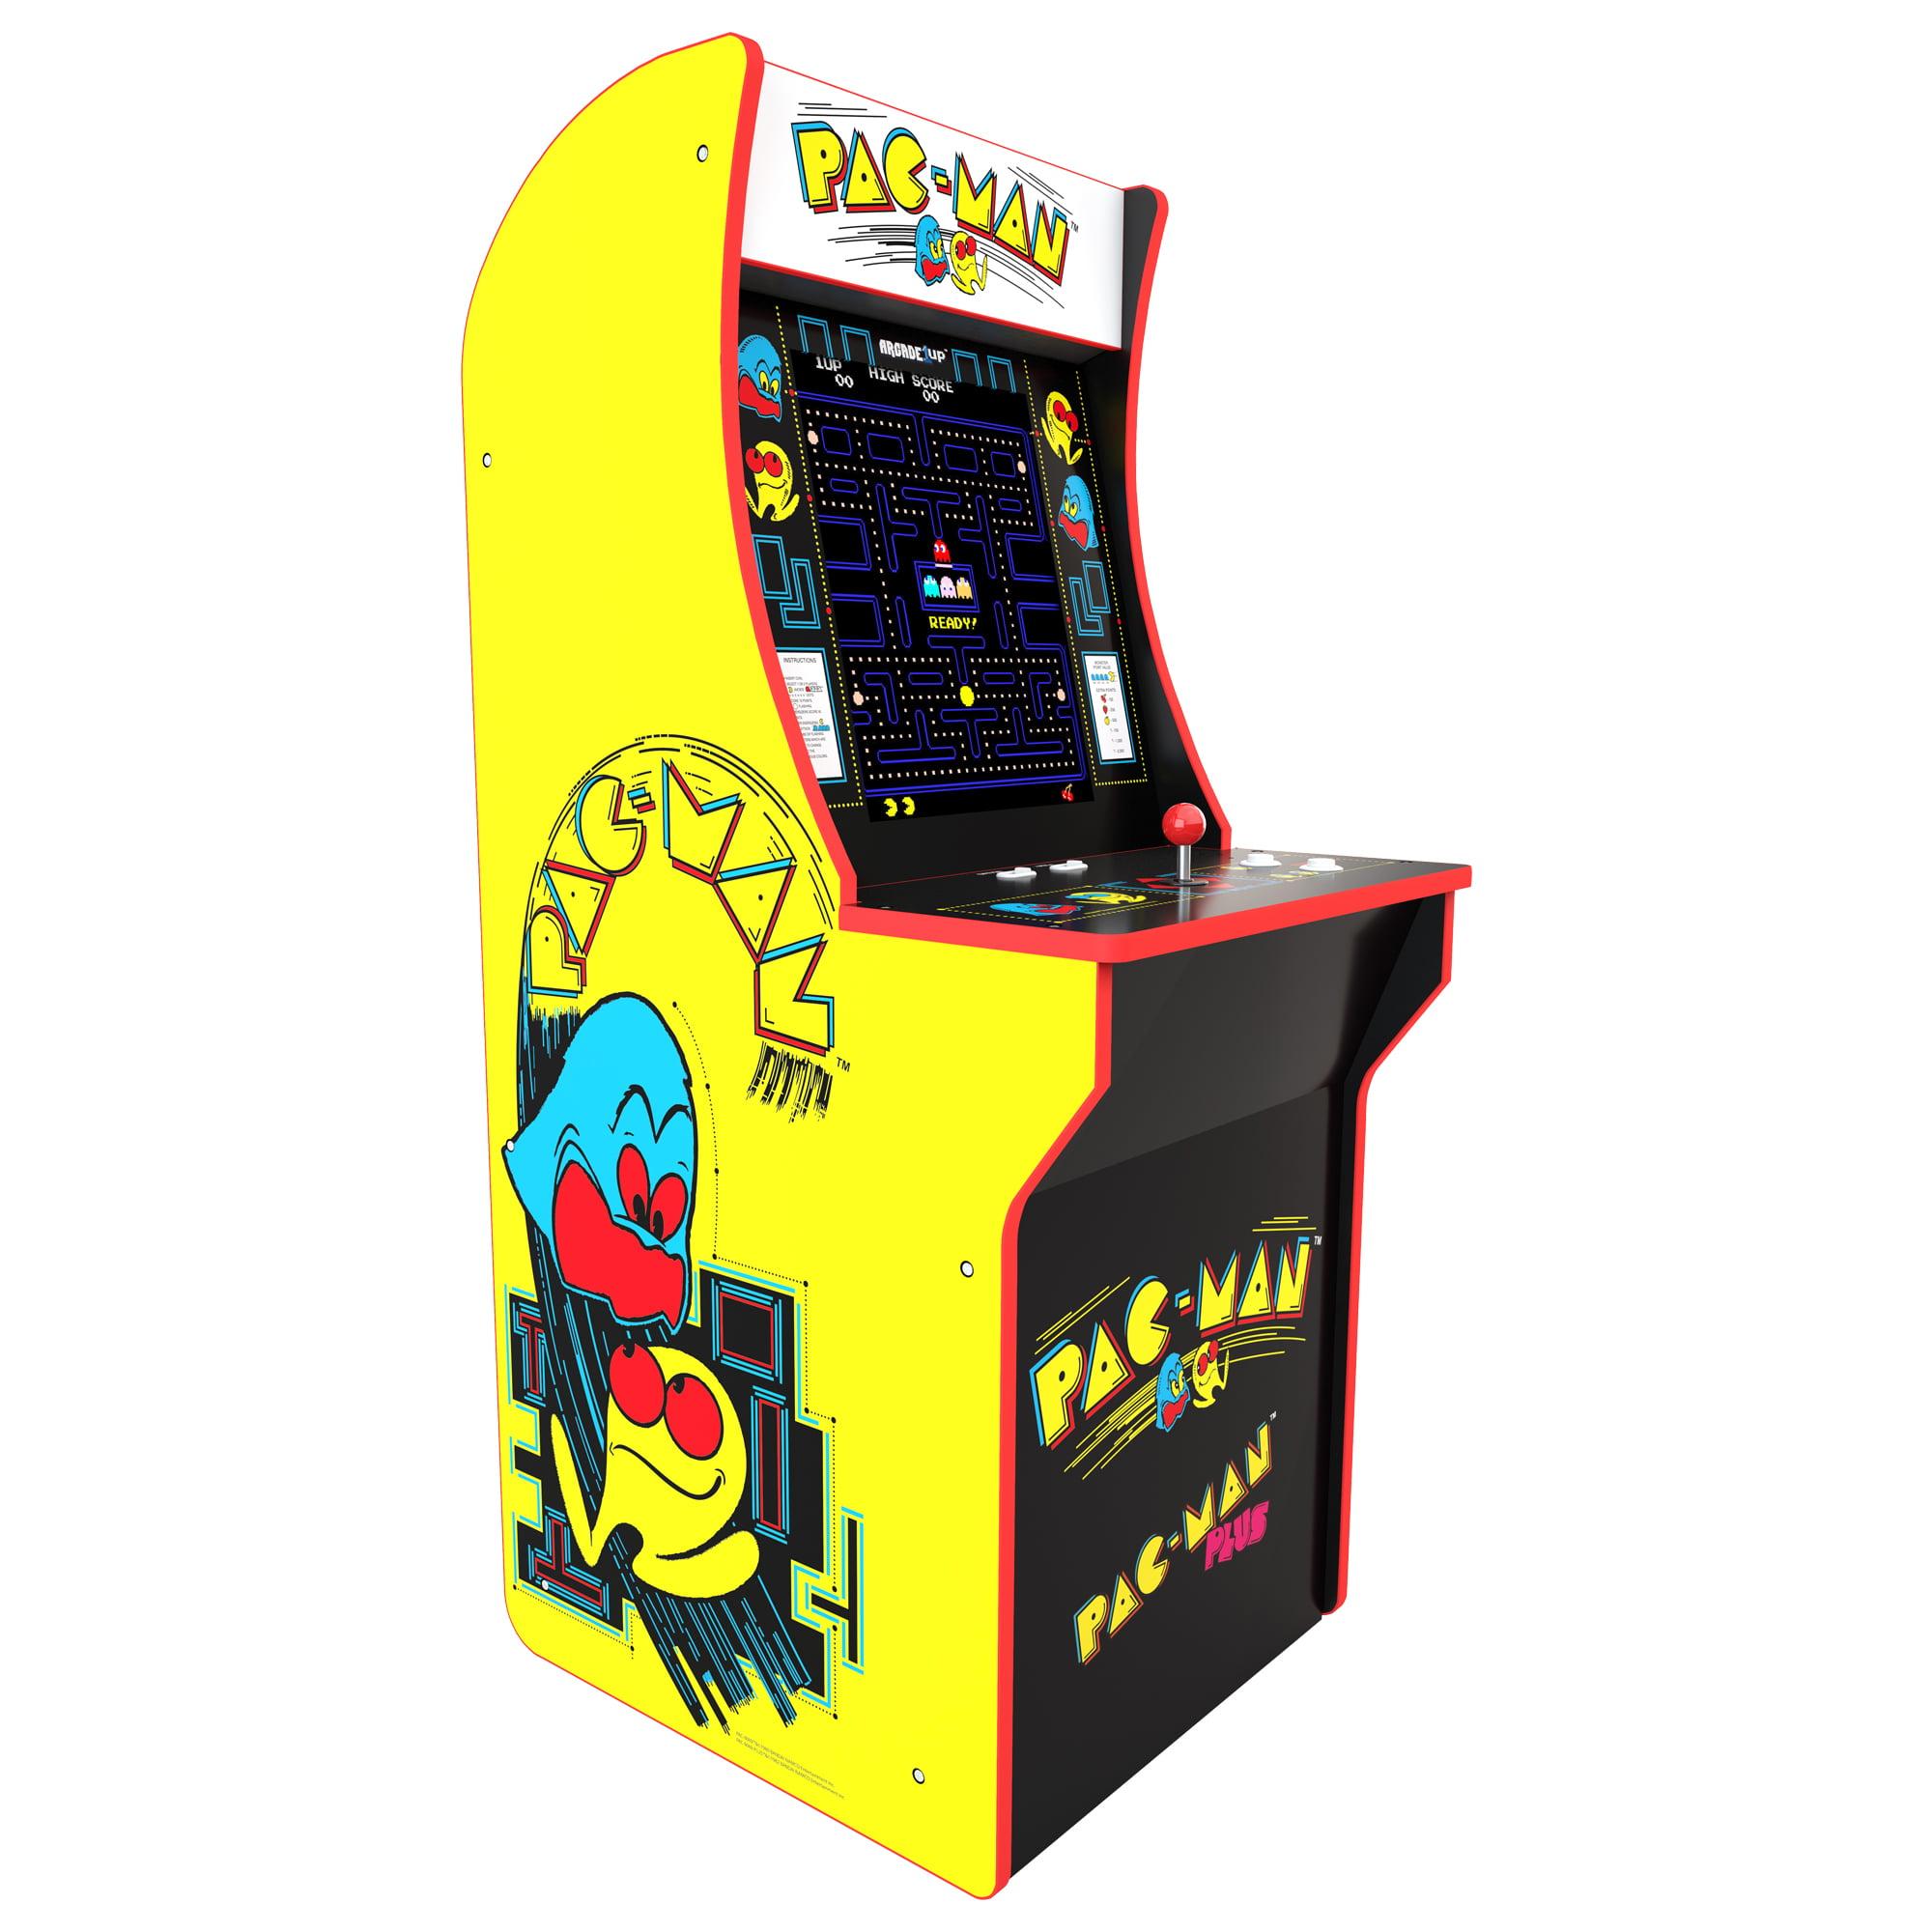 Fantastic Pacman Arcade Machine Arcade1Up 4Ft Download Free Architecture Designs Remcamadebymaigaardcom